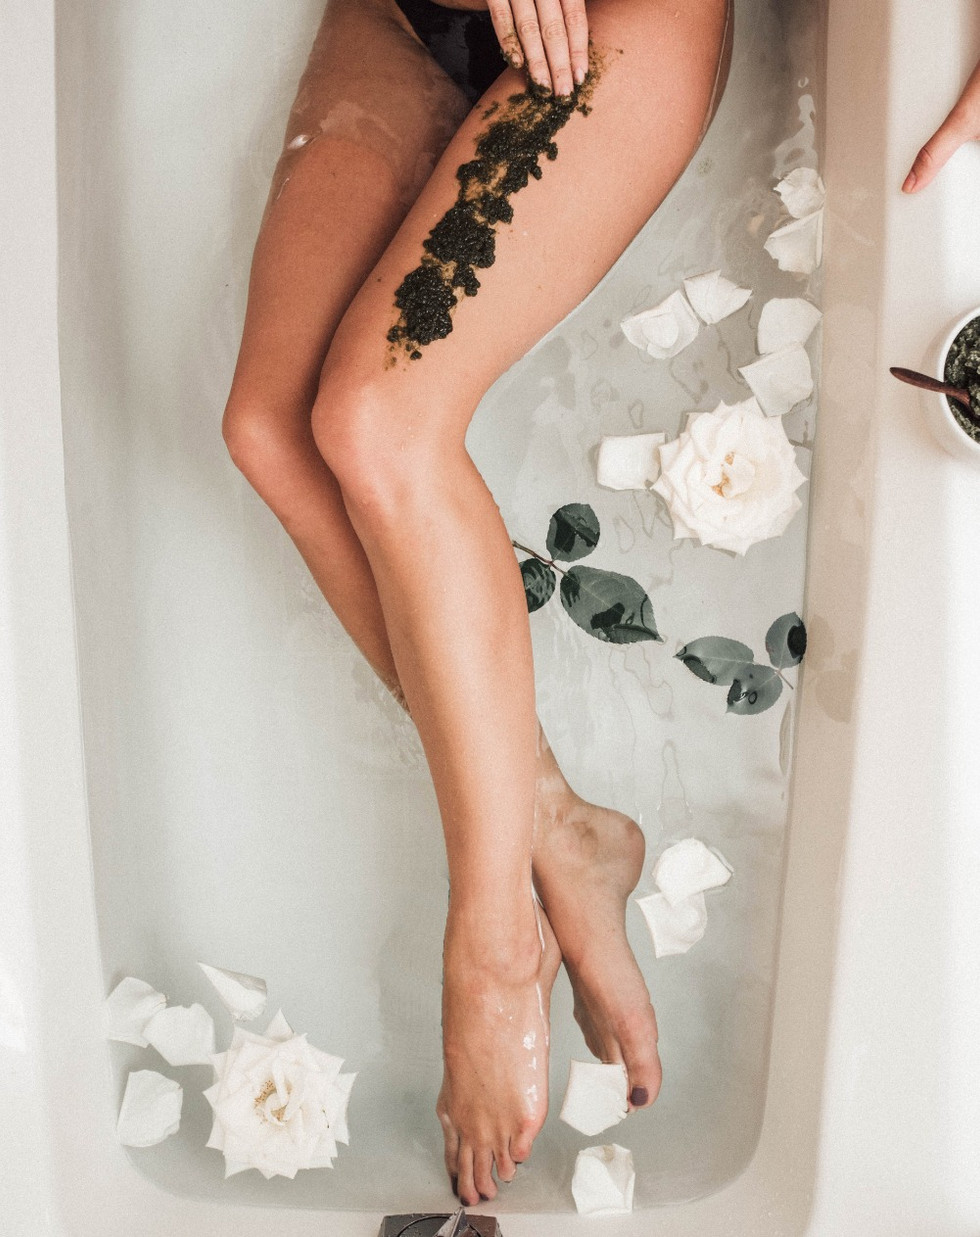 How to Bathe Like a Pro + 12 Natural Bath Essentials